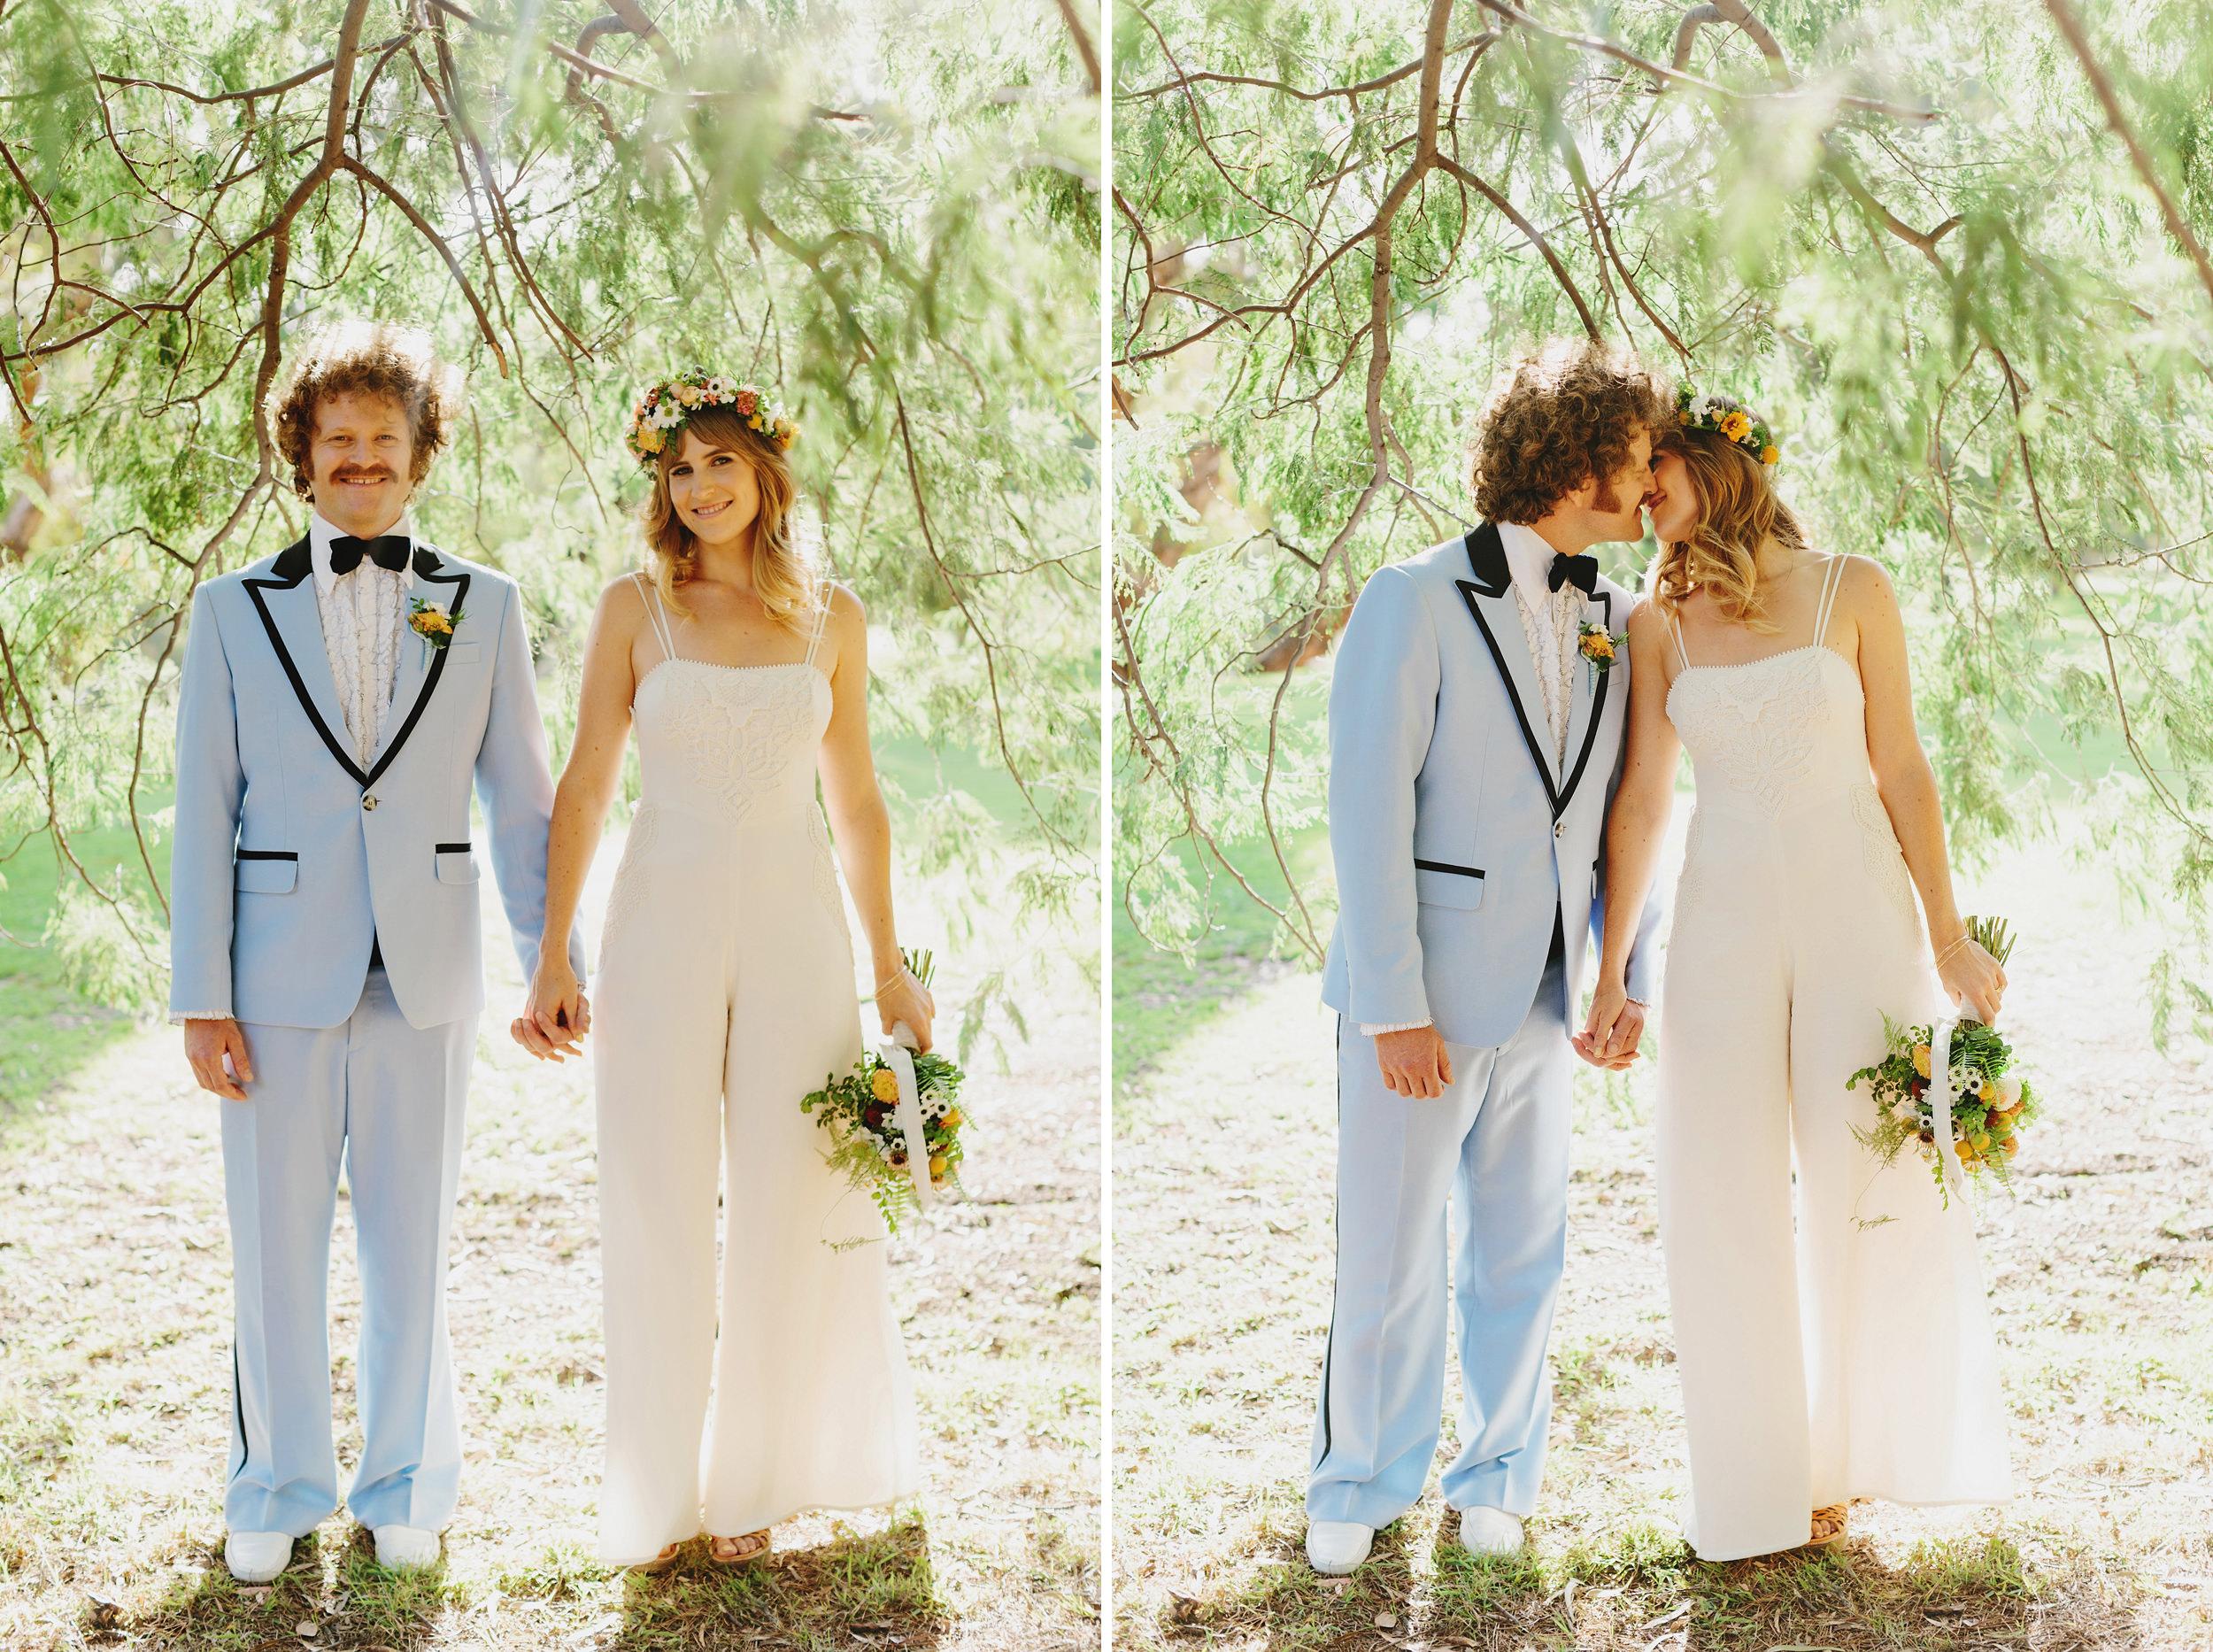 Melbourne_Vintage_Backyard_Wedding_Ben_Erin 055.JPG